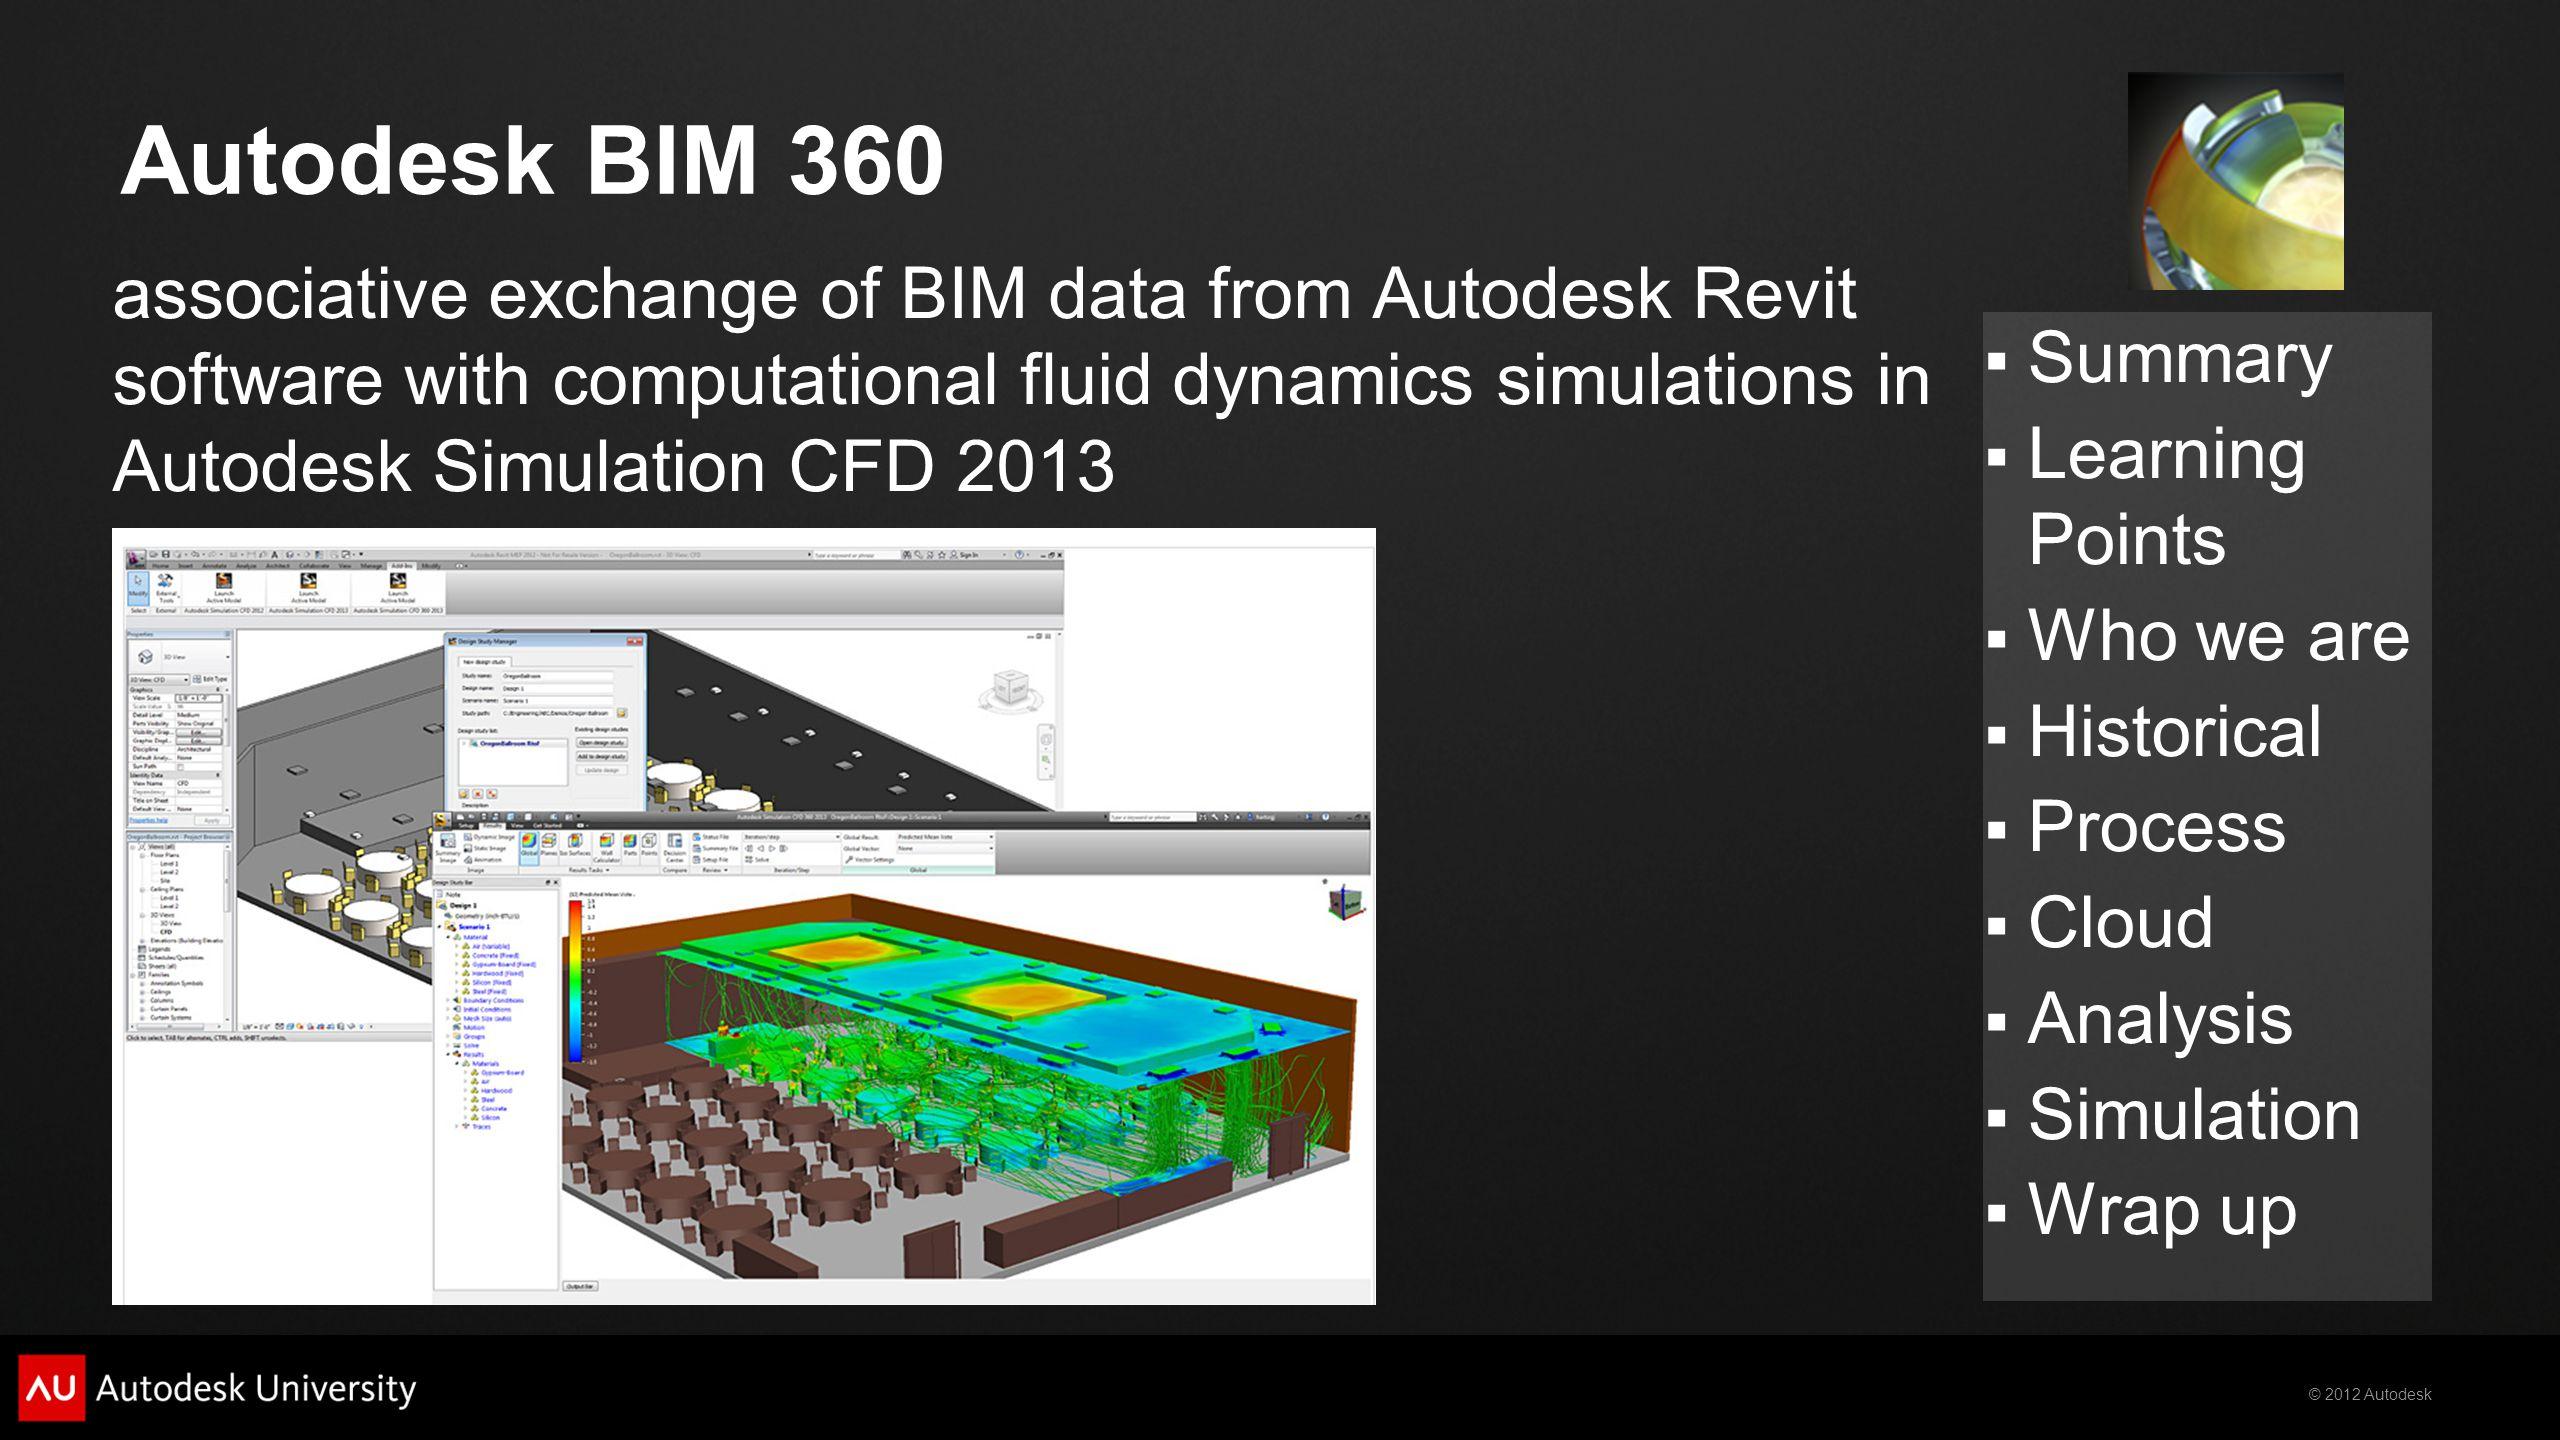 © 2012 Autodesk  Summary  Learning Points  Who we are  Historical  Process  Cloud  Analysis  Simulation  Wrap up Autodesk BIM 360 associative